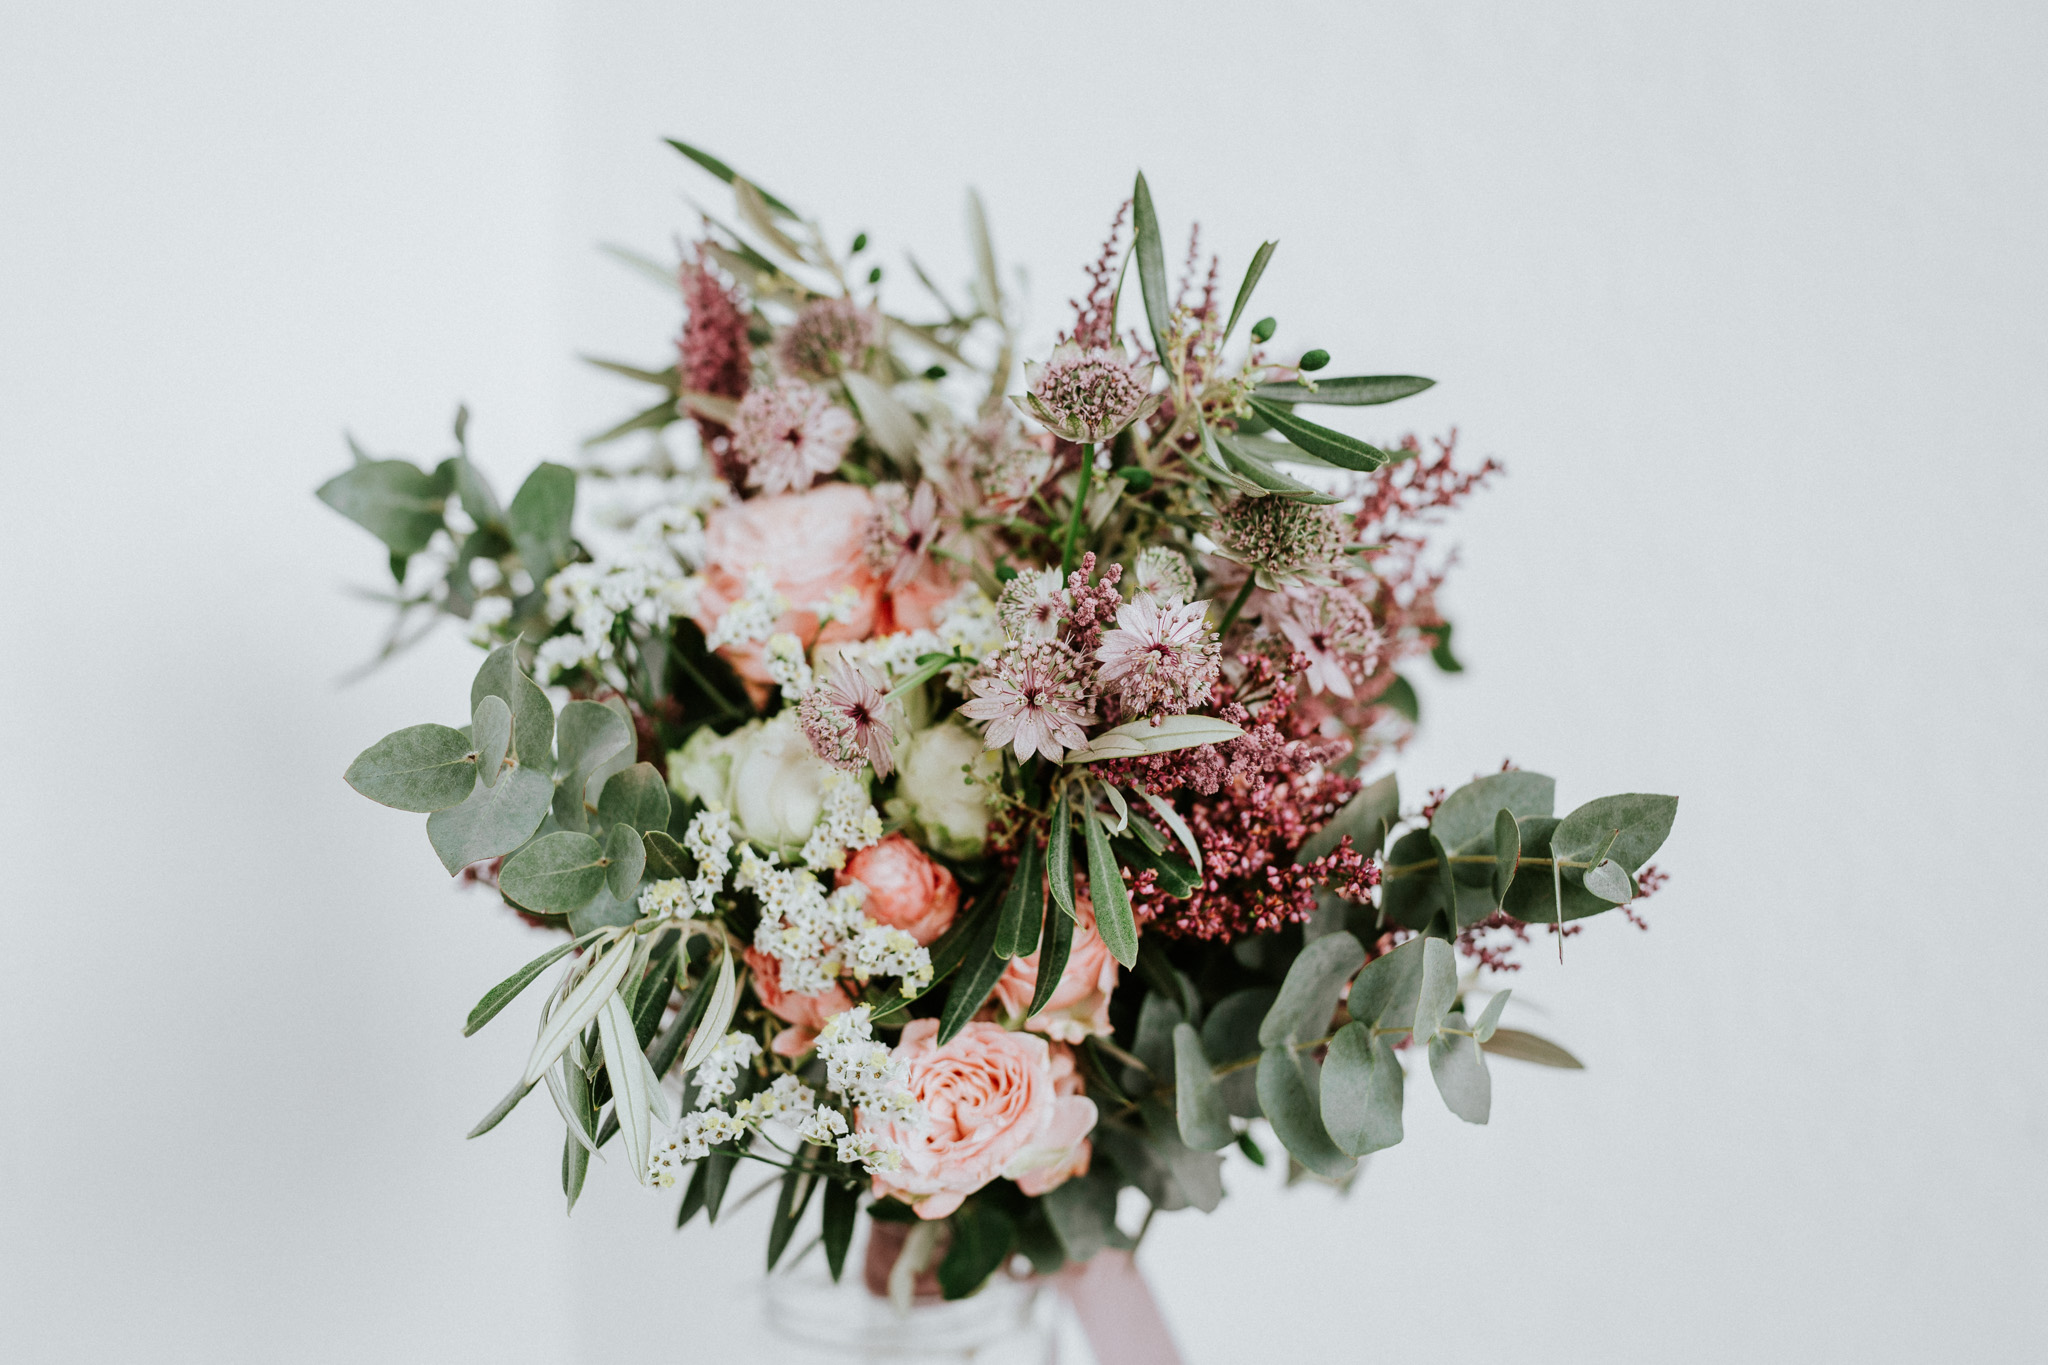 fotografia-boda-wedding-photographer-spain-concorazon-13